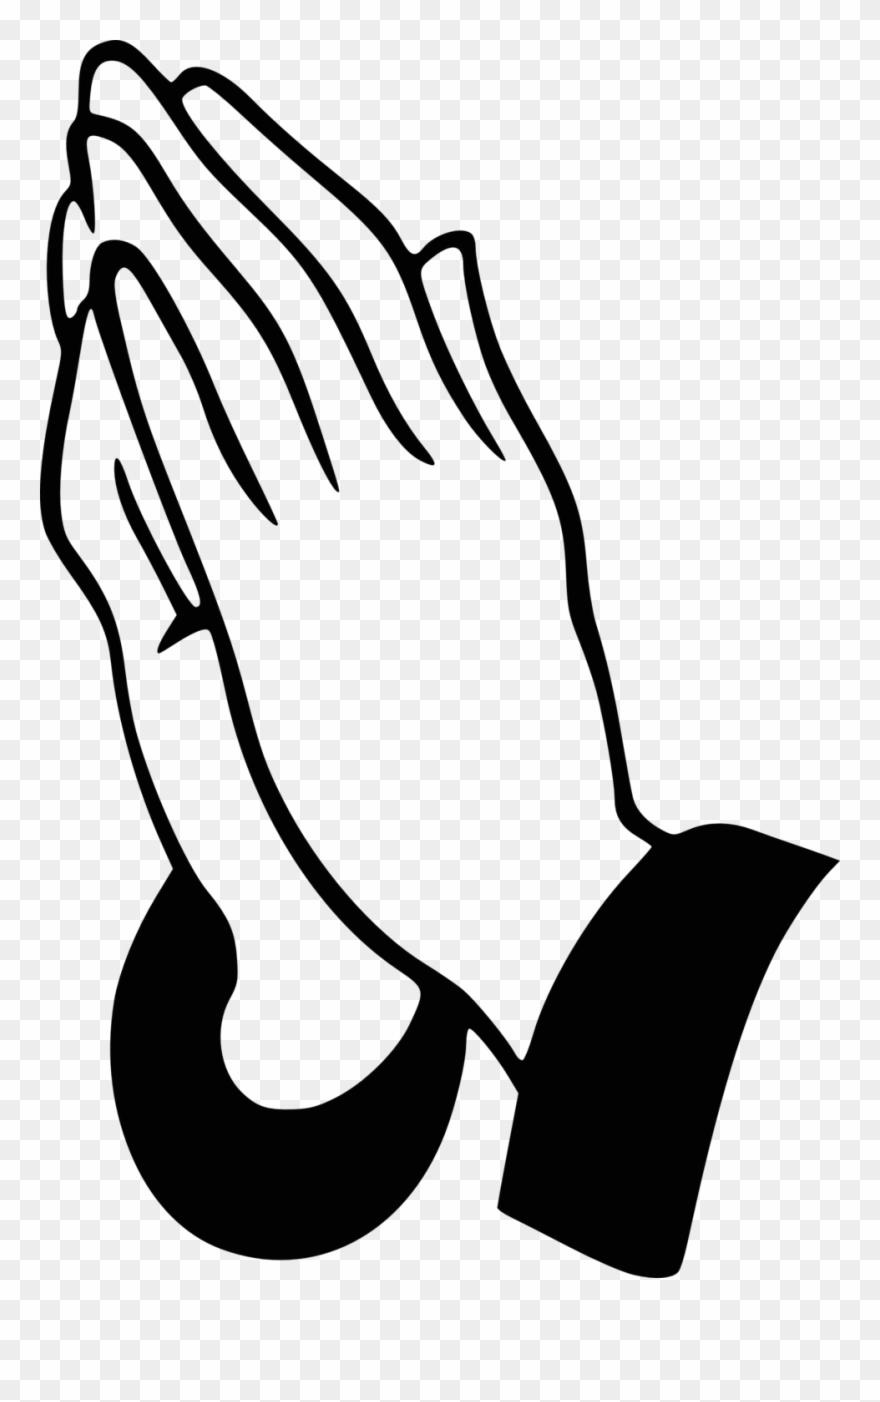 Baseball Clipart Errortape Free Clipart Prayer Hands.